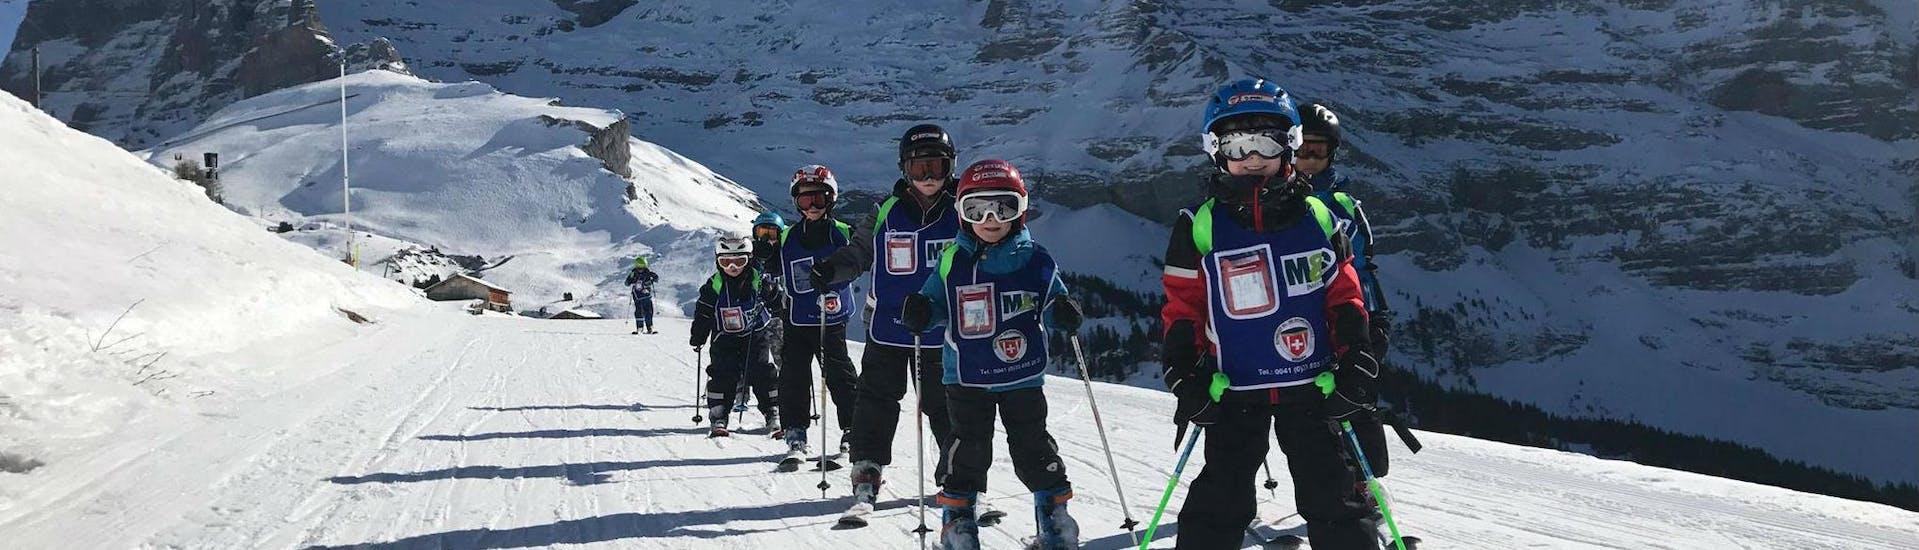 Kids Ski Lessons (from 3 y.) for Beginners met Schweizer Ski- und Snowboardschule Wengen - Hero image